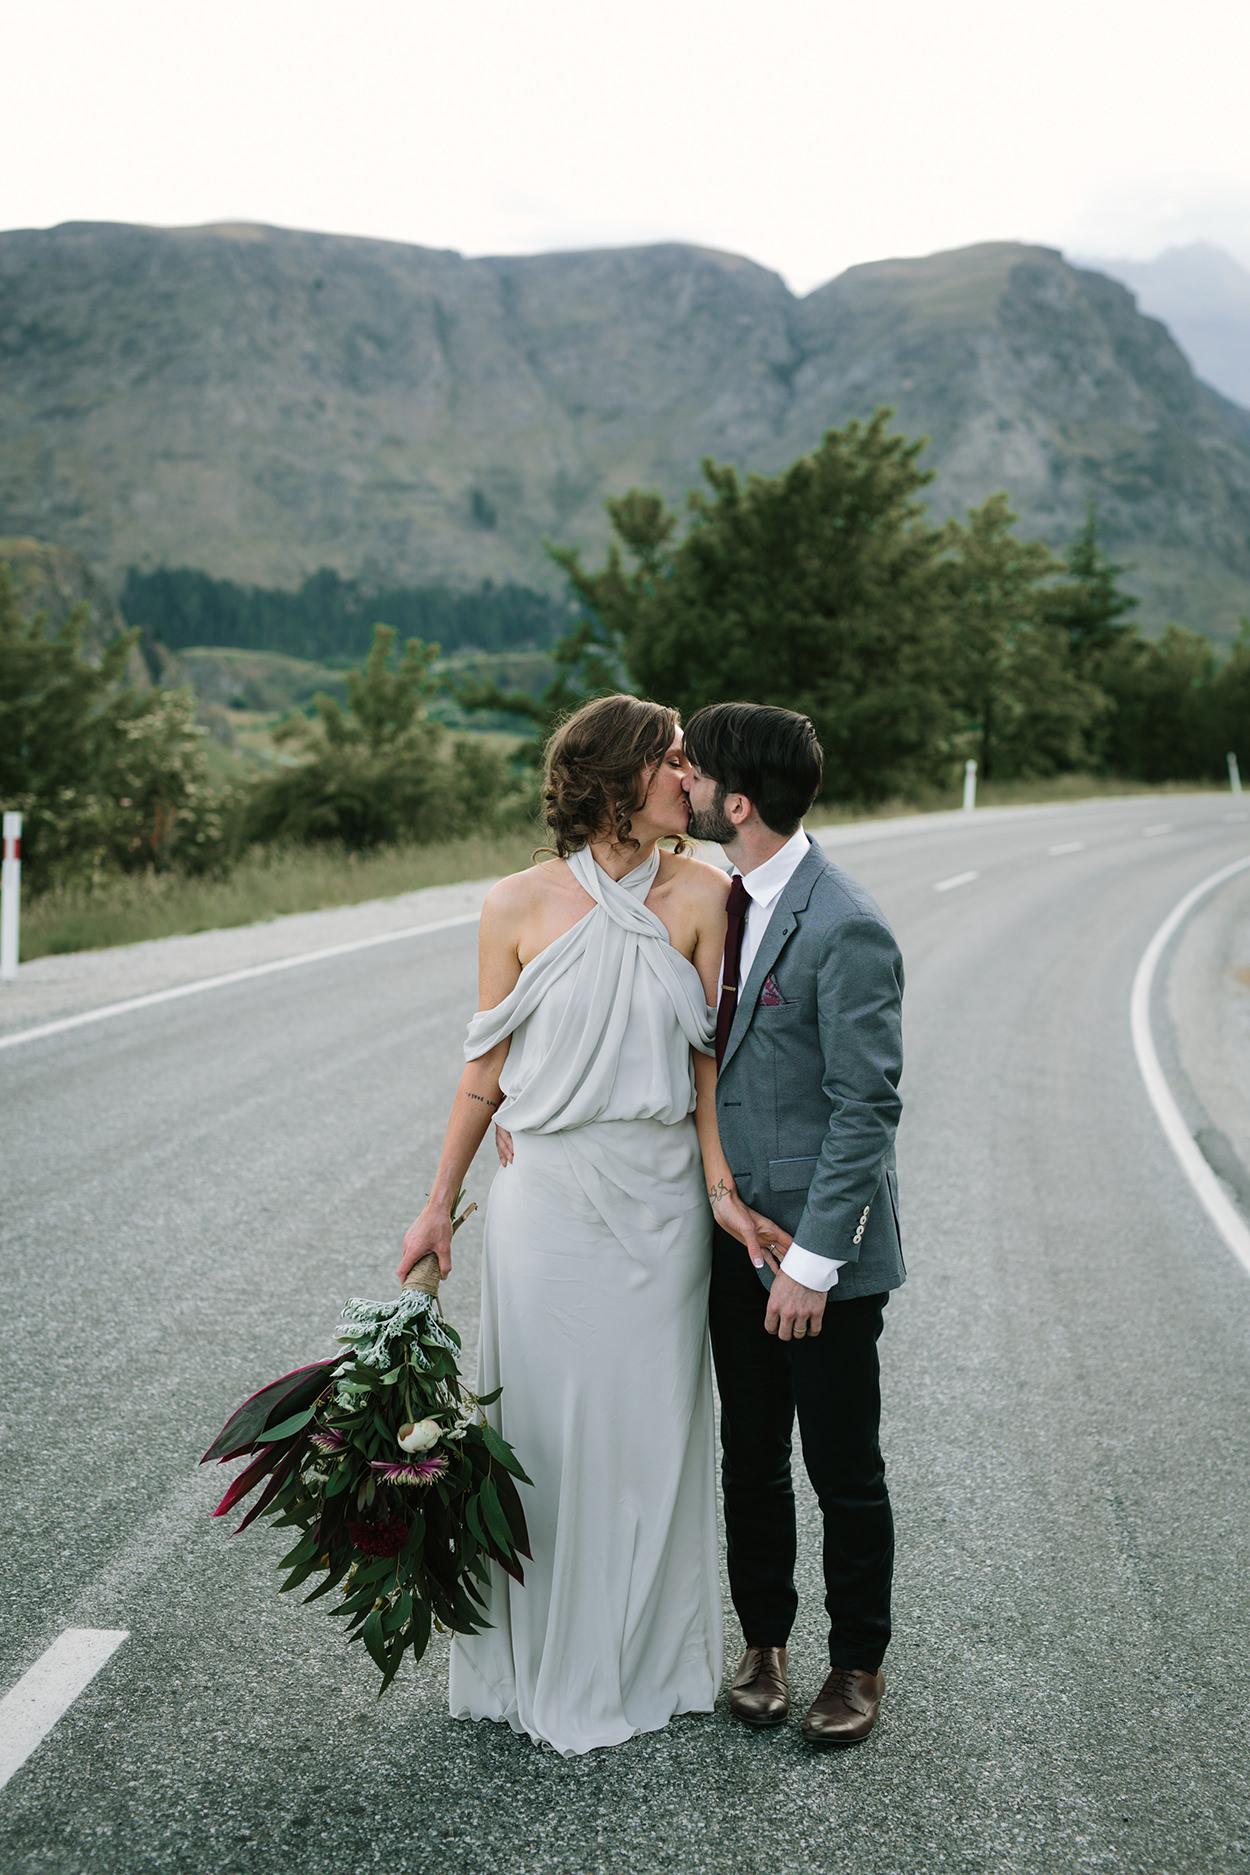 I-Got-You-Babe-Weddings-Cara-Joel-Elopement-New-Zealand0118.JPG